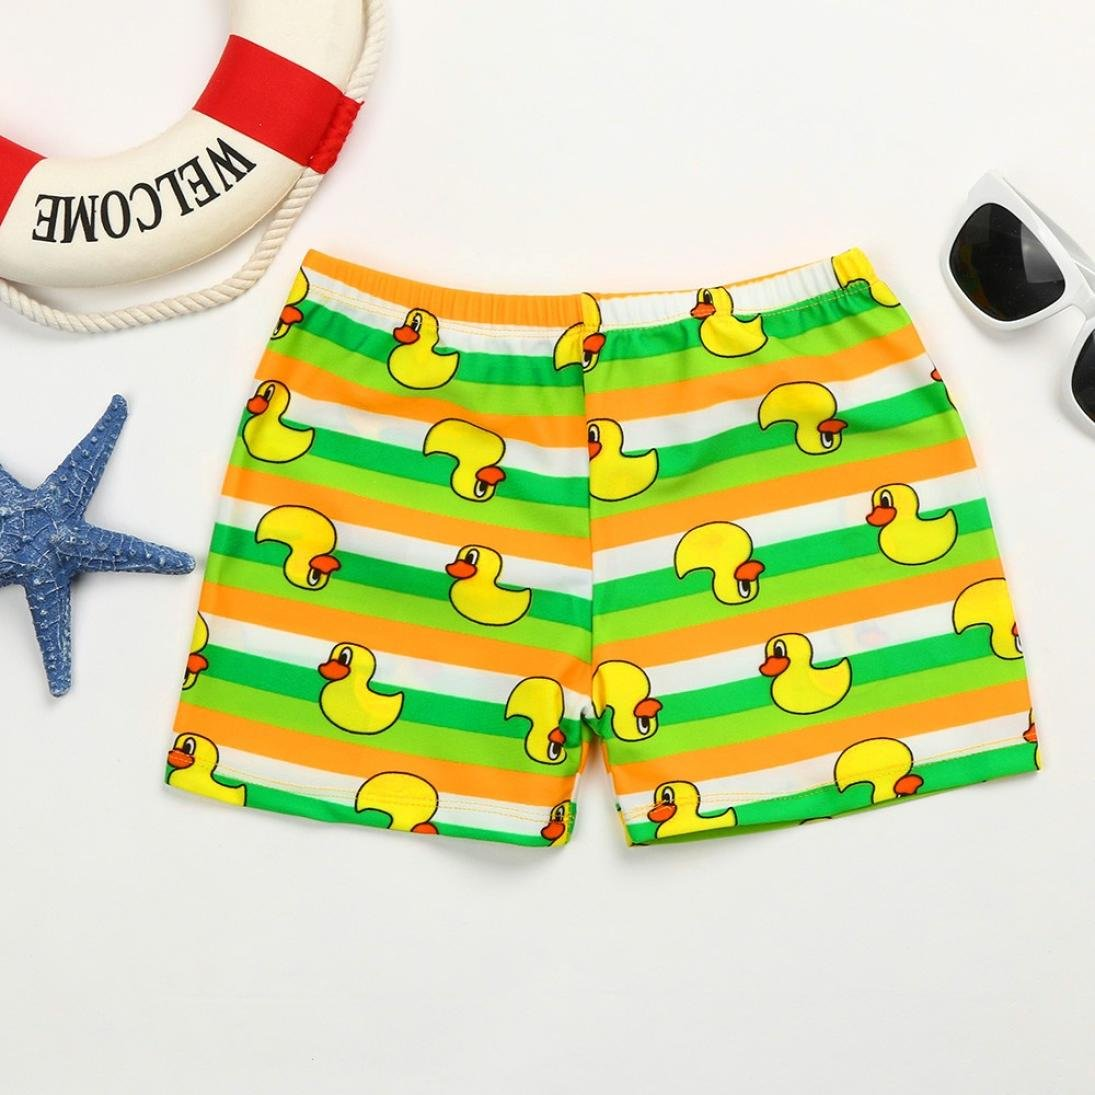 Elevin Toddler Kids Boys Striped Beach Swim wear Trunks Briefs 0-10T TM Swimsuit for Boys